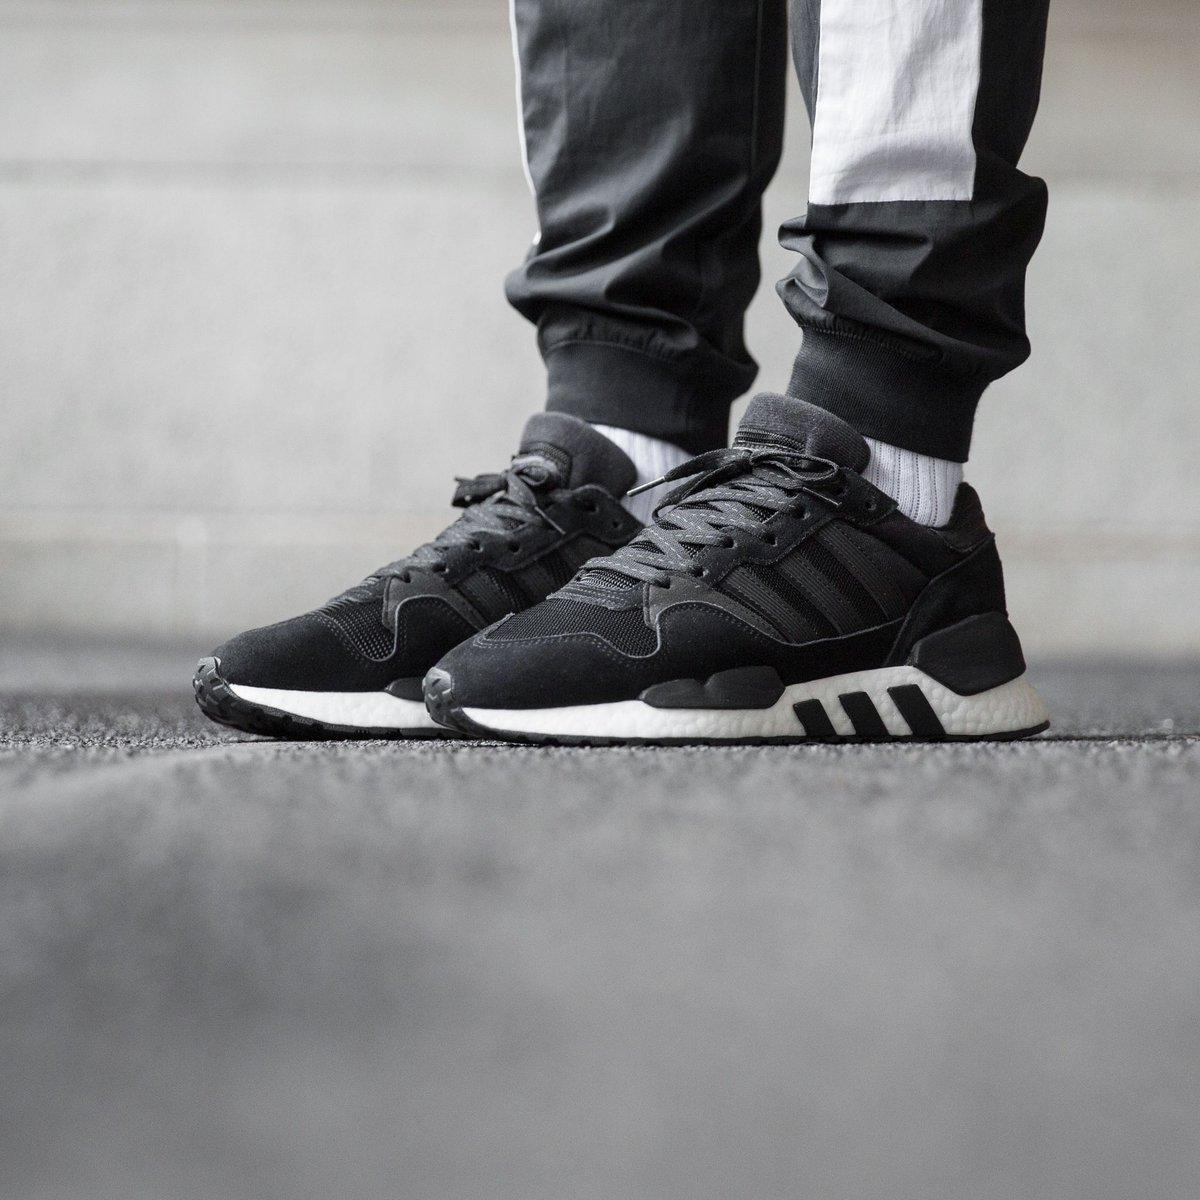 7DSxuYZh6U #adidas #zx930 #eqt